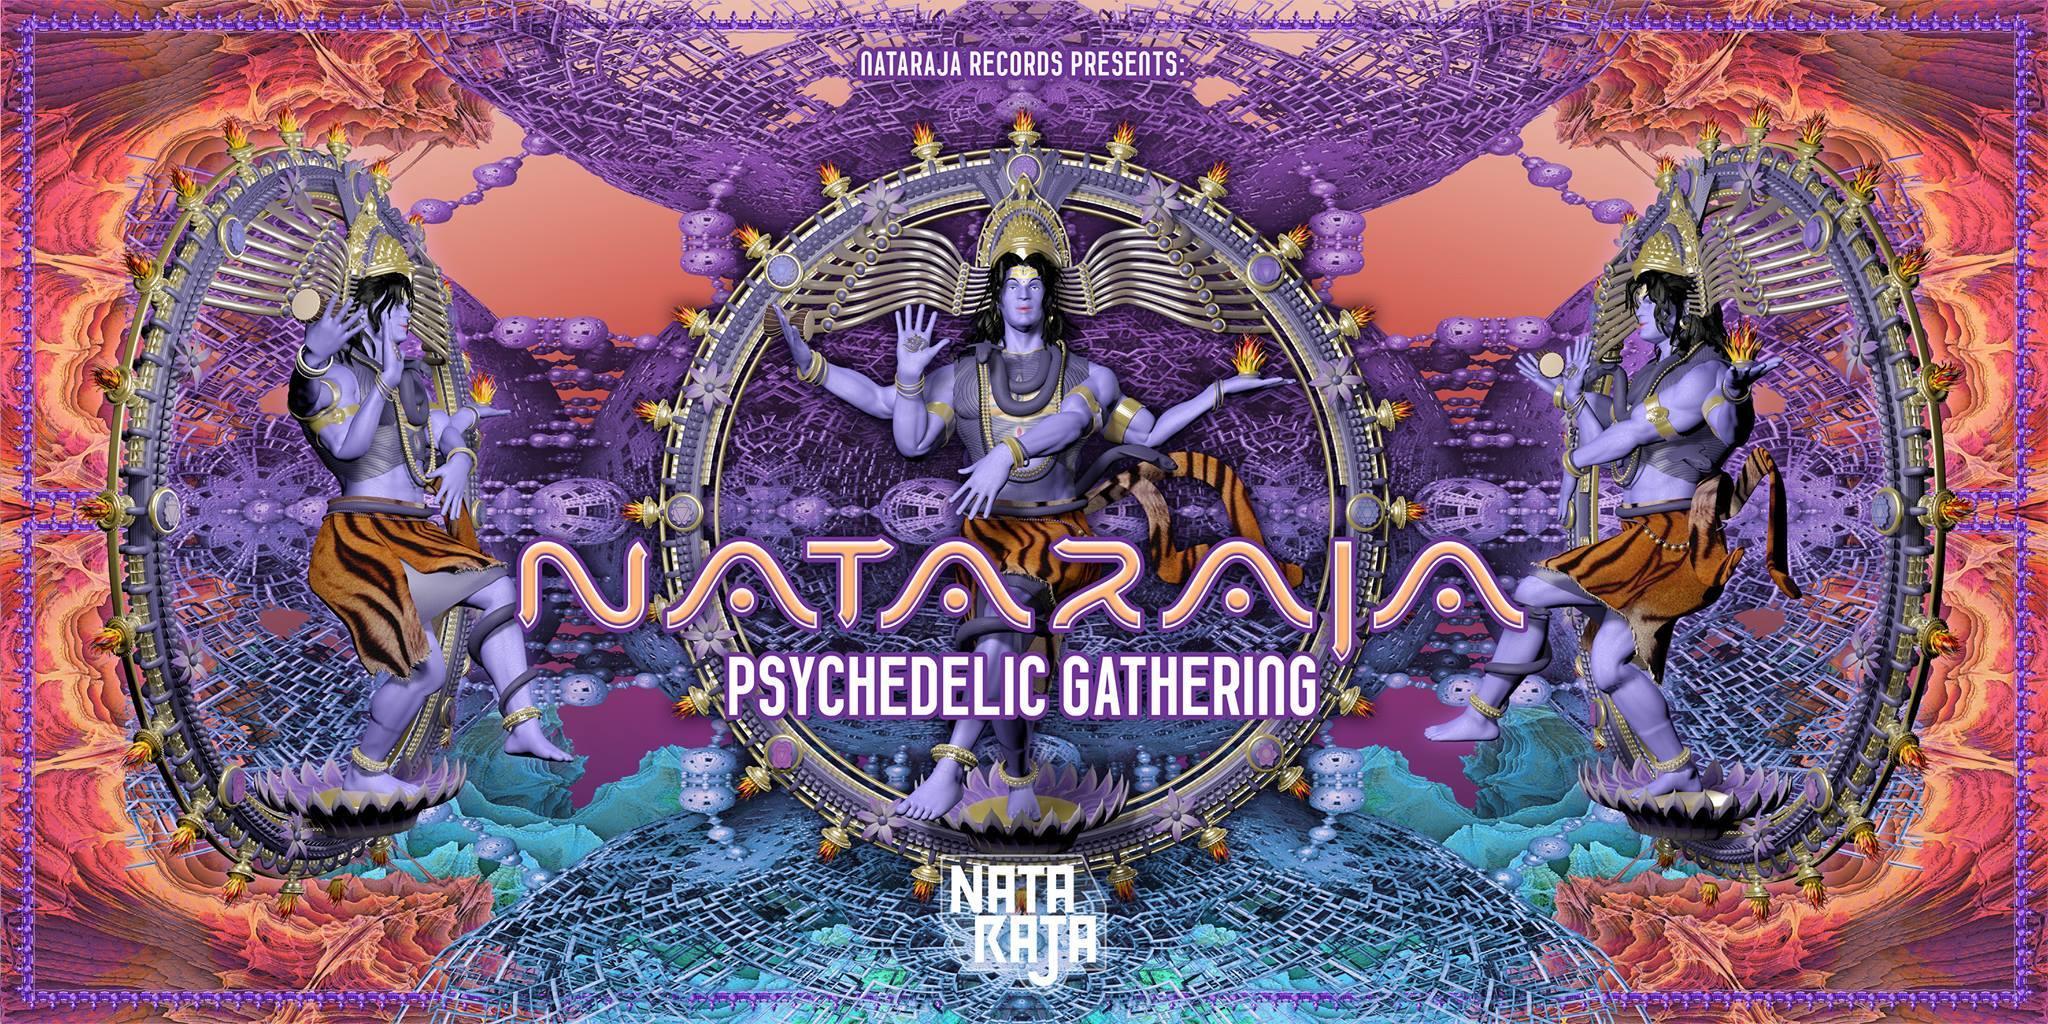 Nataraja Psychedelic Gathering